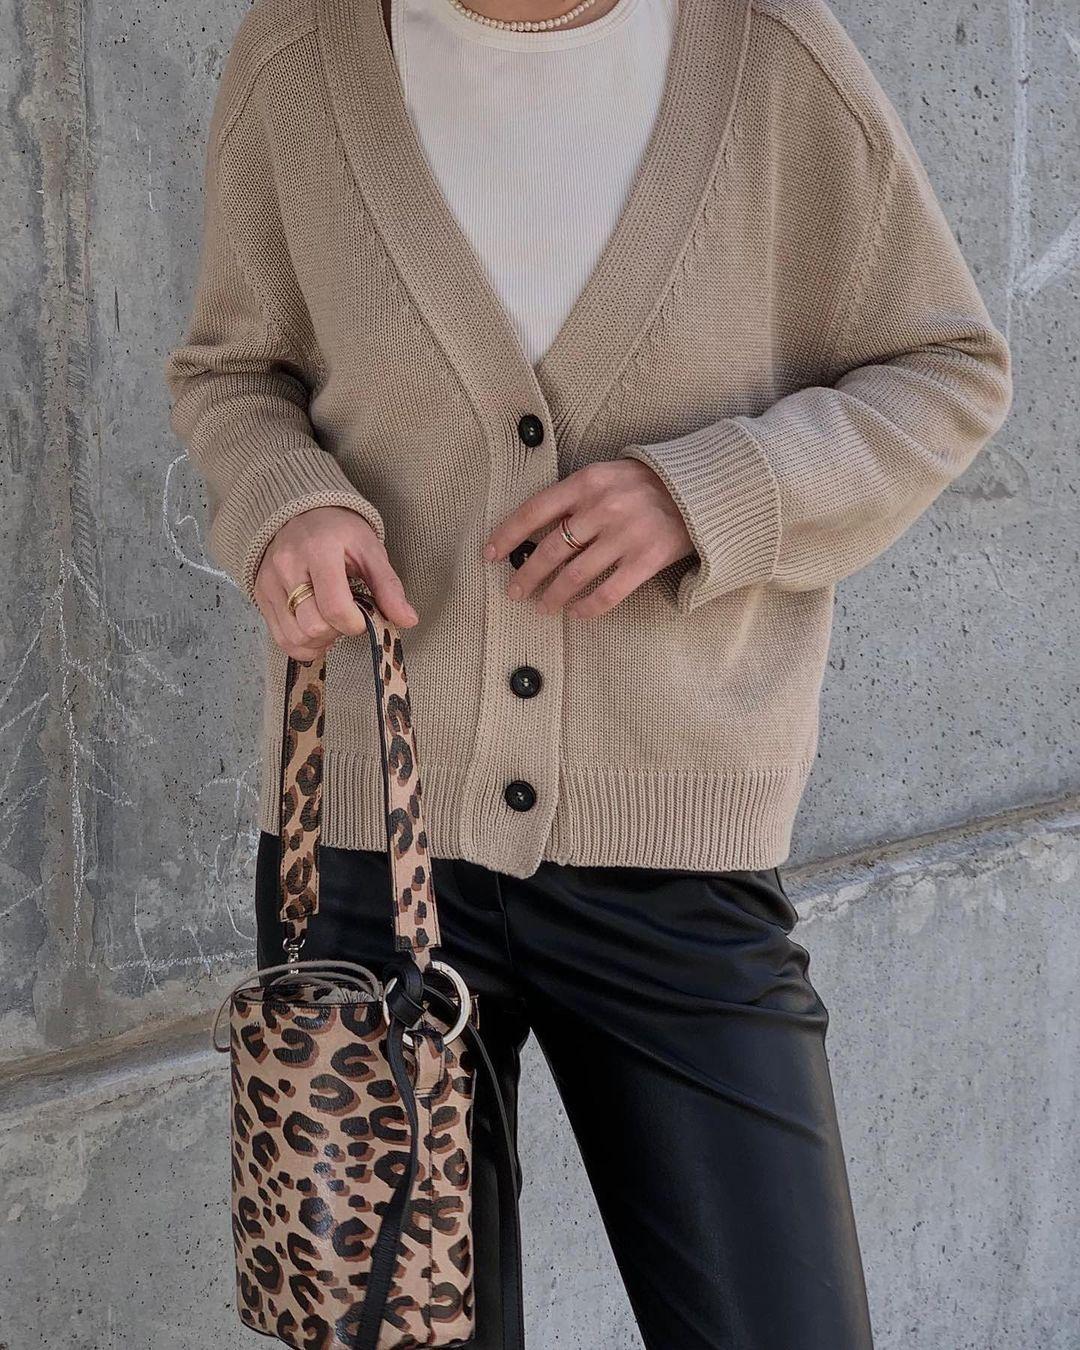 модный кардиган осень зима 2021 украинский бренд бежевый